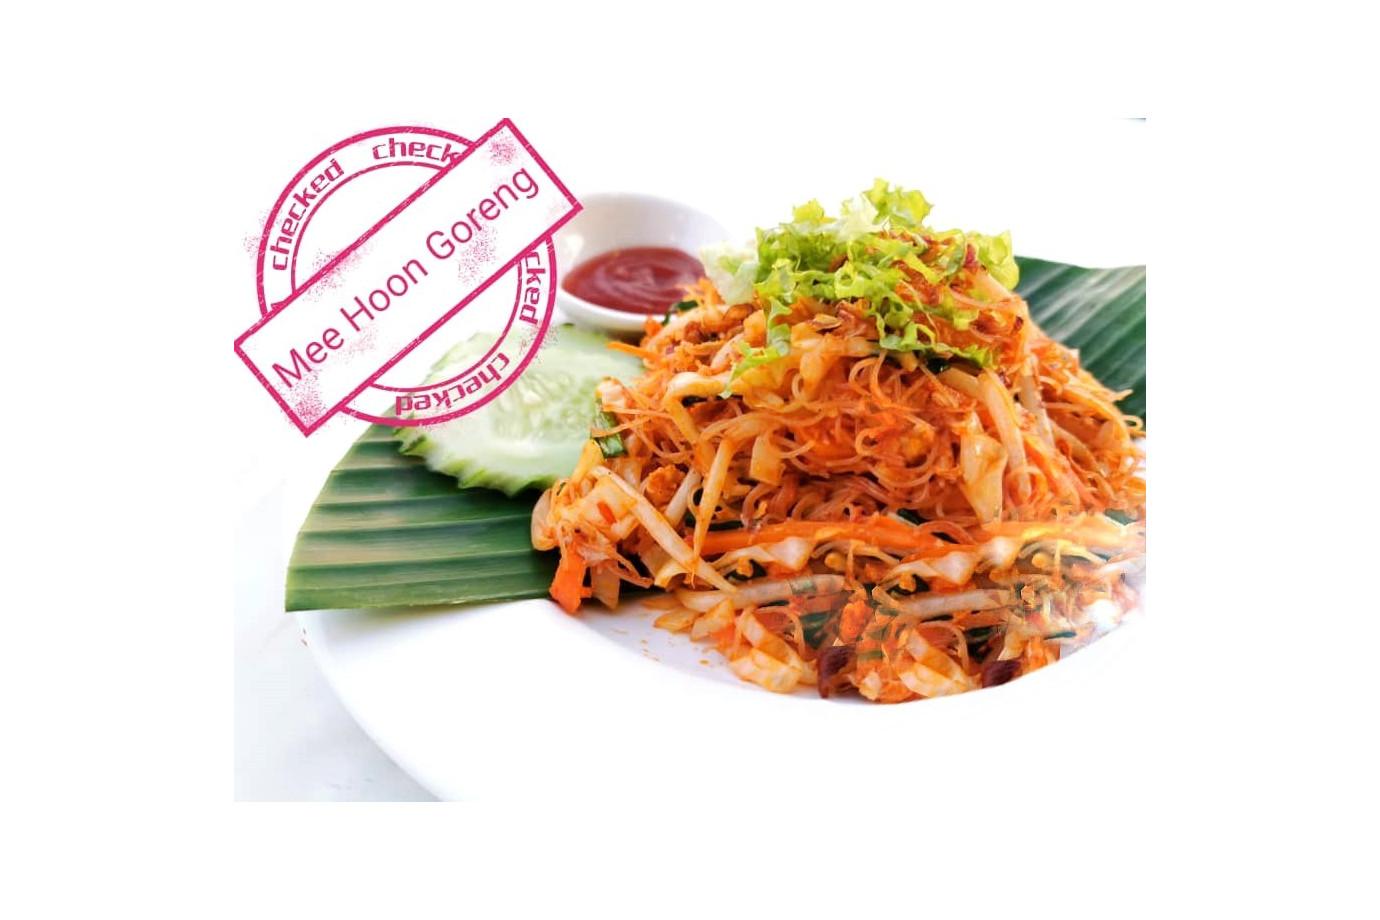 desaru amerald station food hub johor malaysia